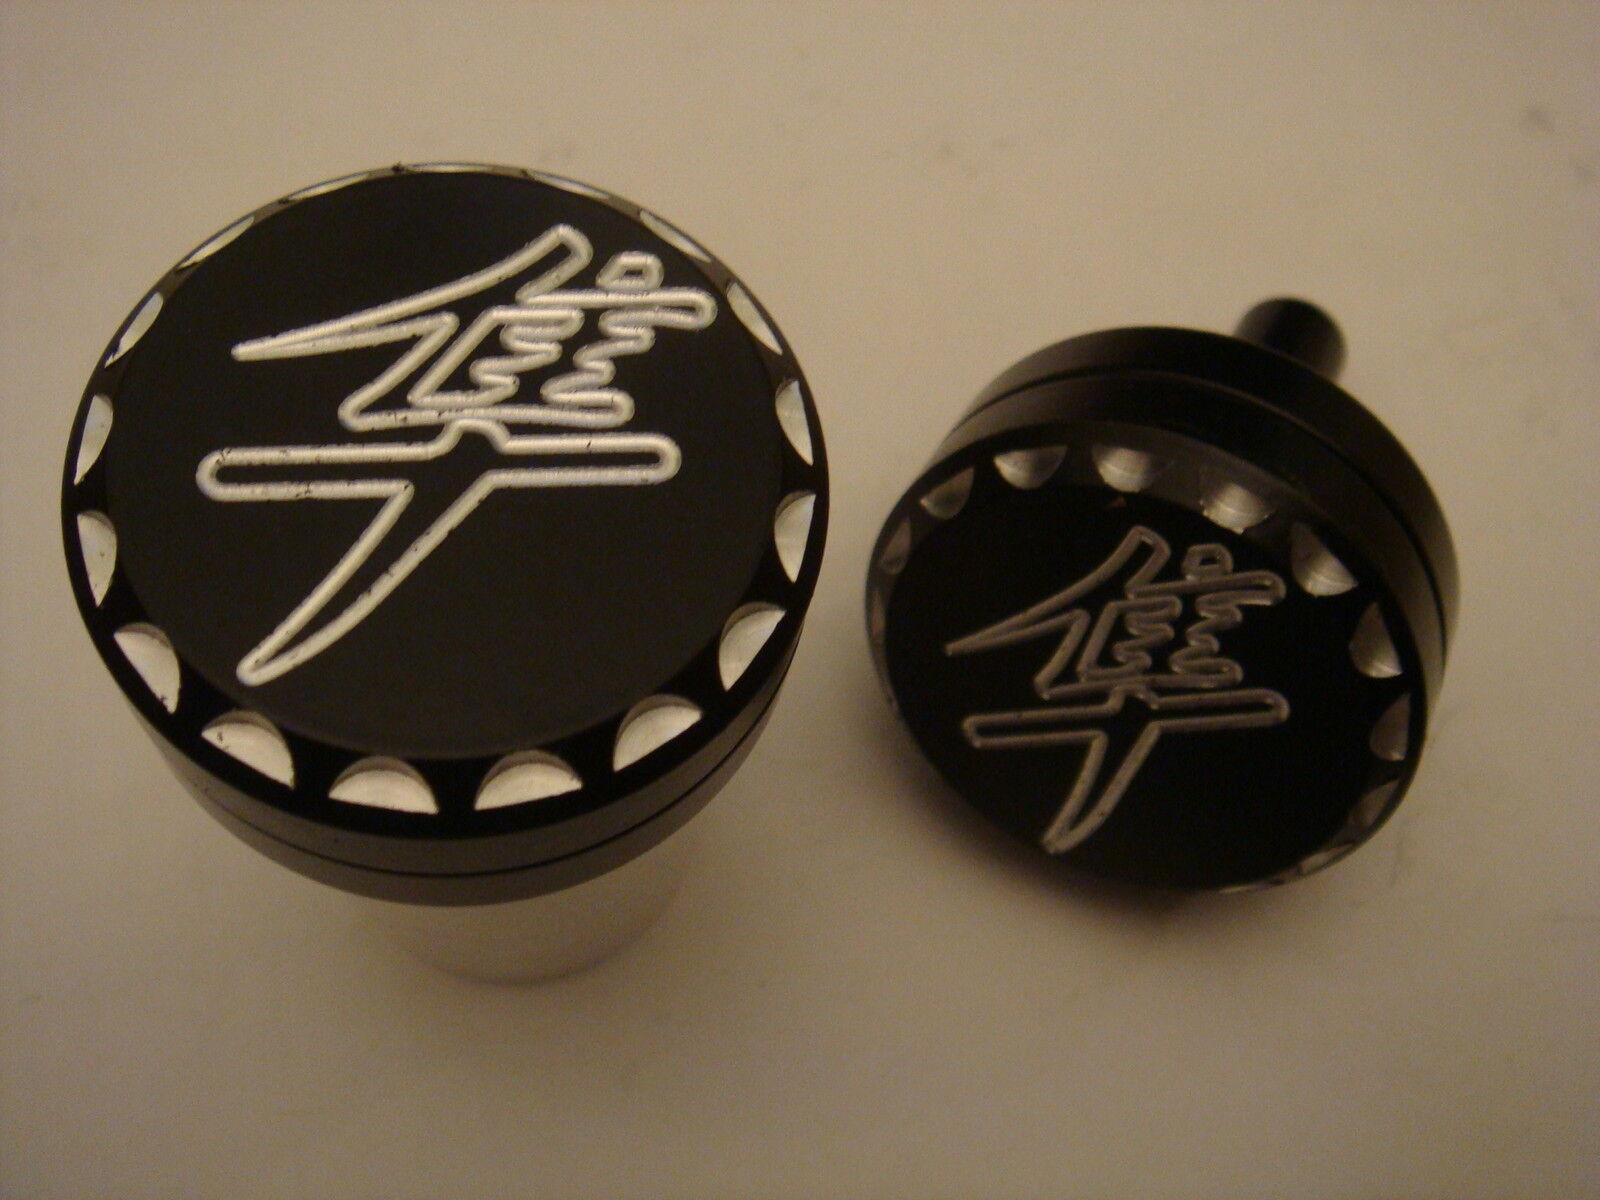 Black Kanji Suzuki Hayabusa 1300 Scale Cut Frame Sliders